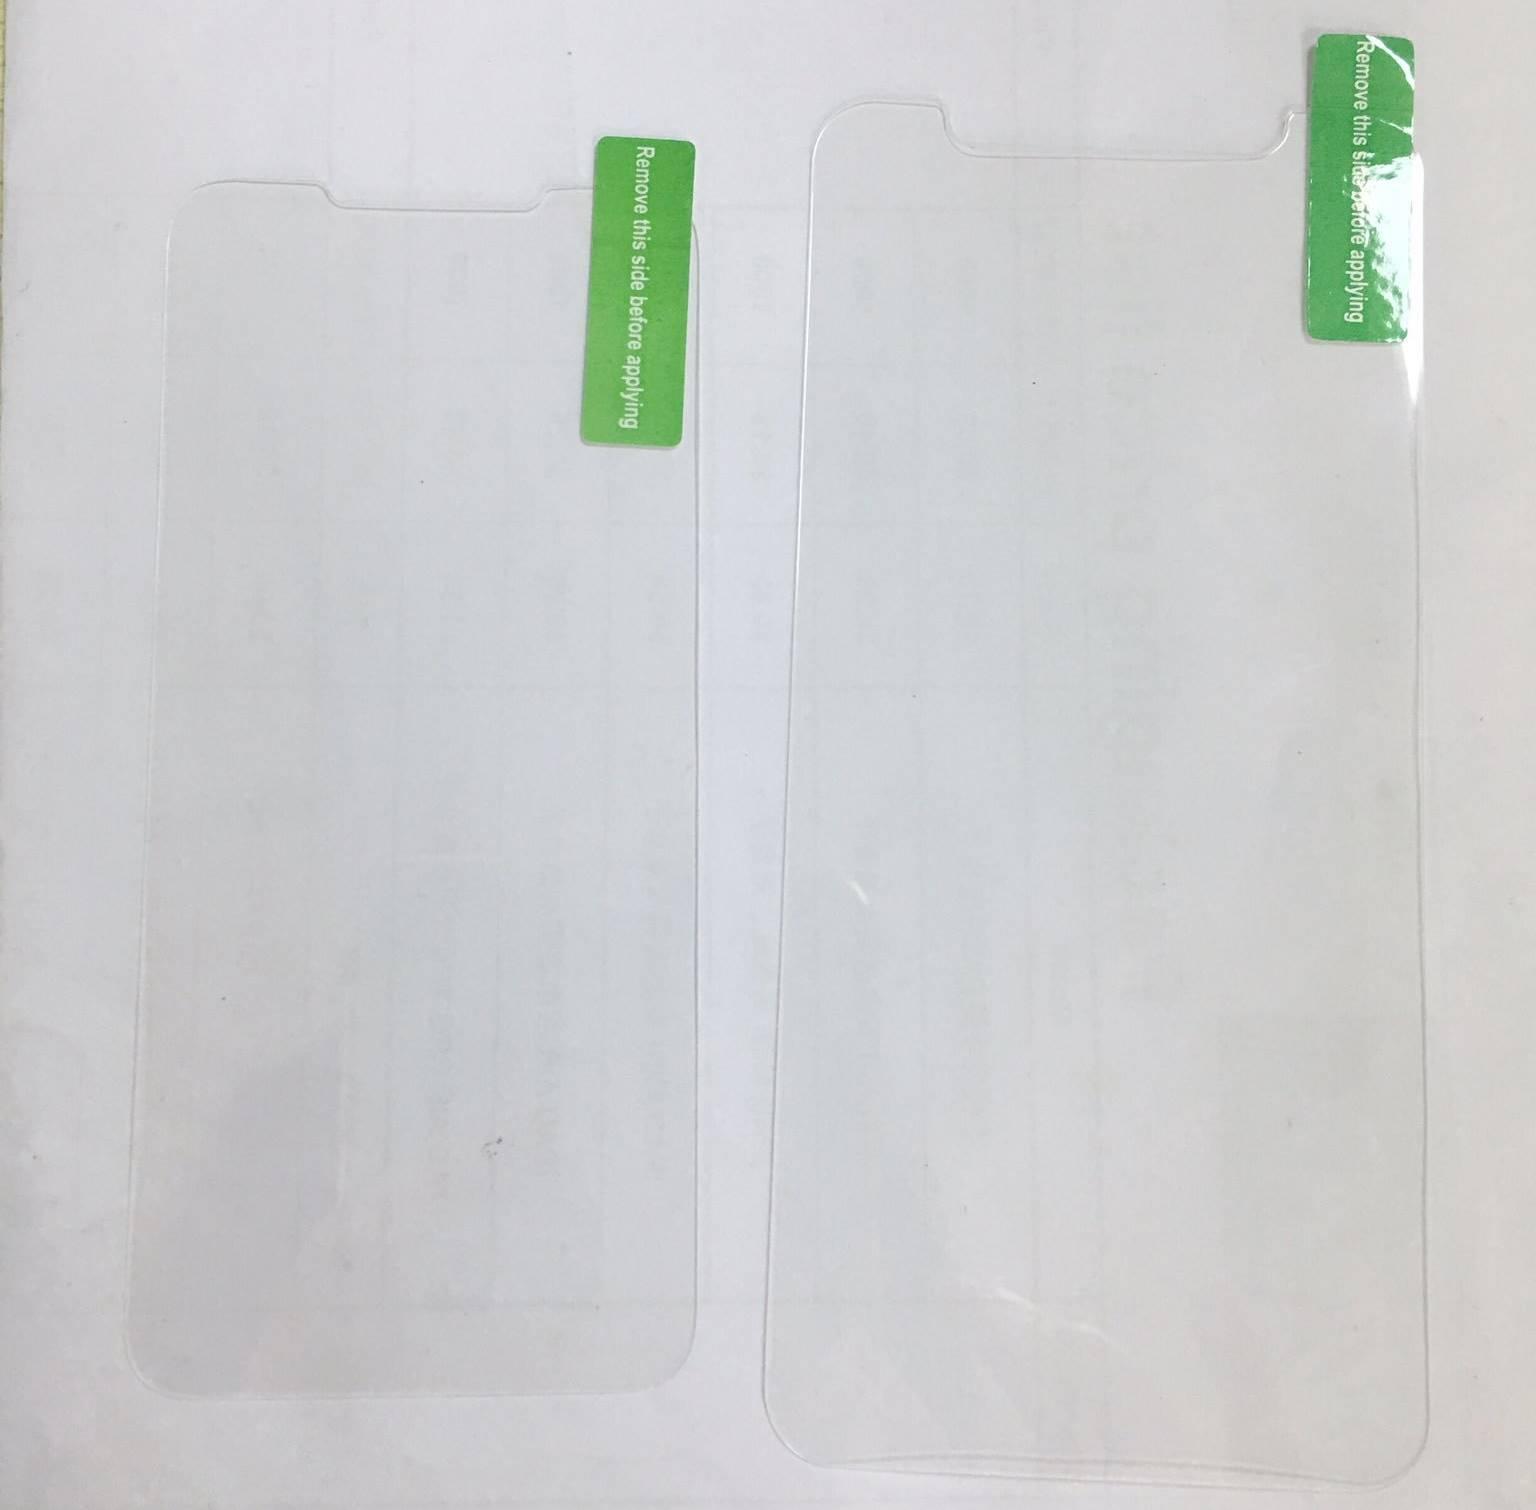 iPhone SE 2 Imagine Confirma Design 1